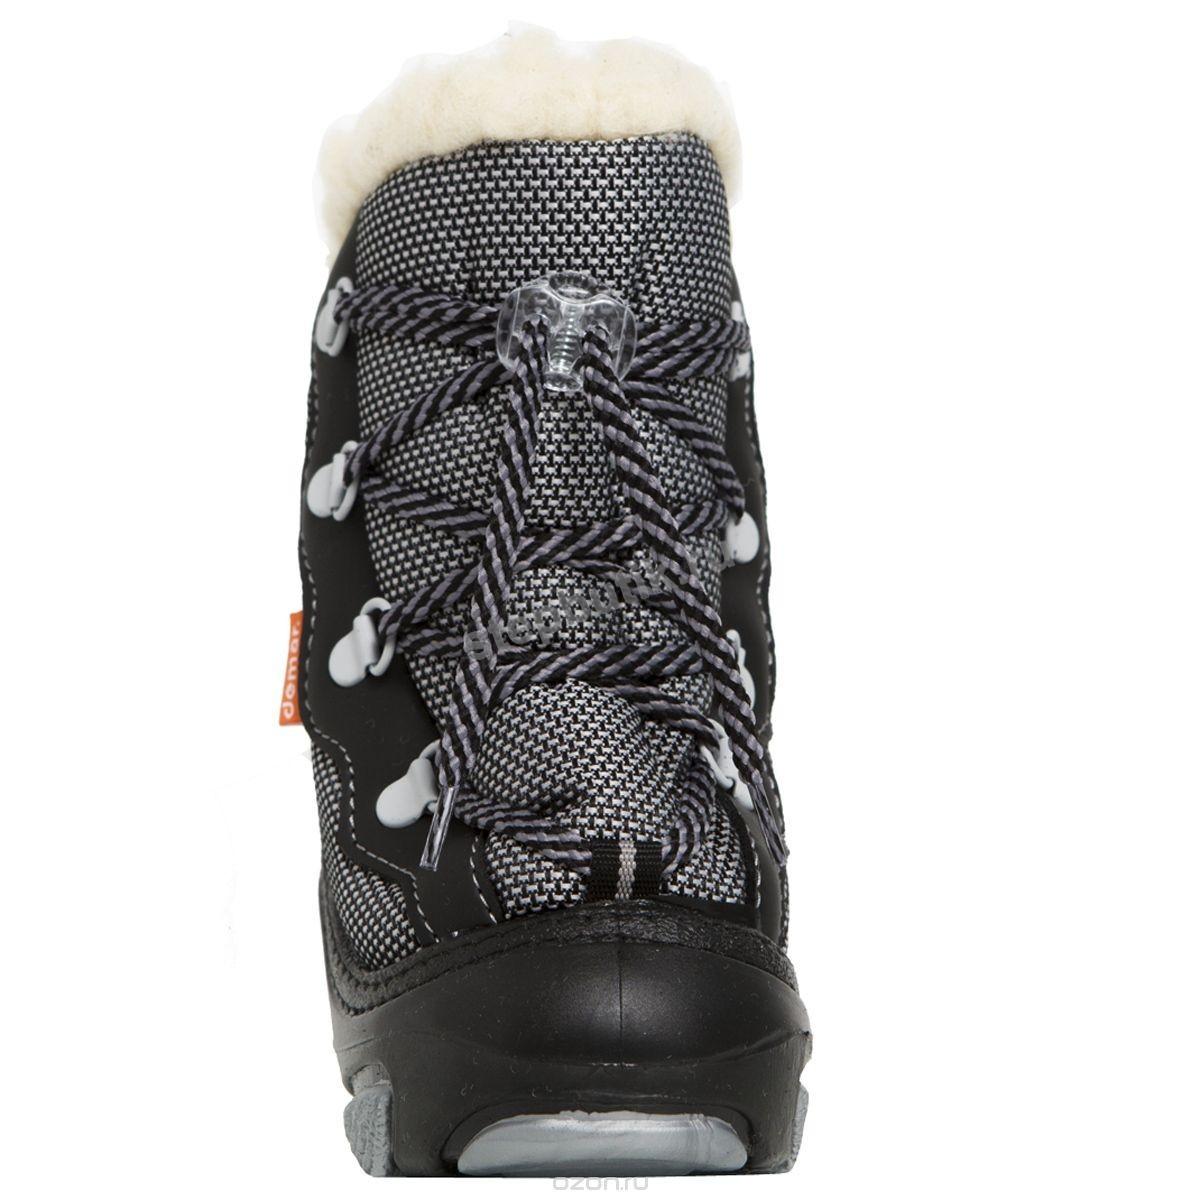 *4017 SNOW MAR Сапожки (20-29) серый